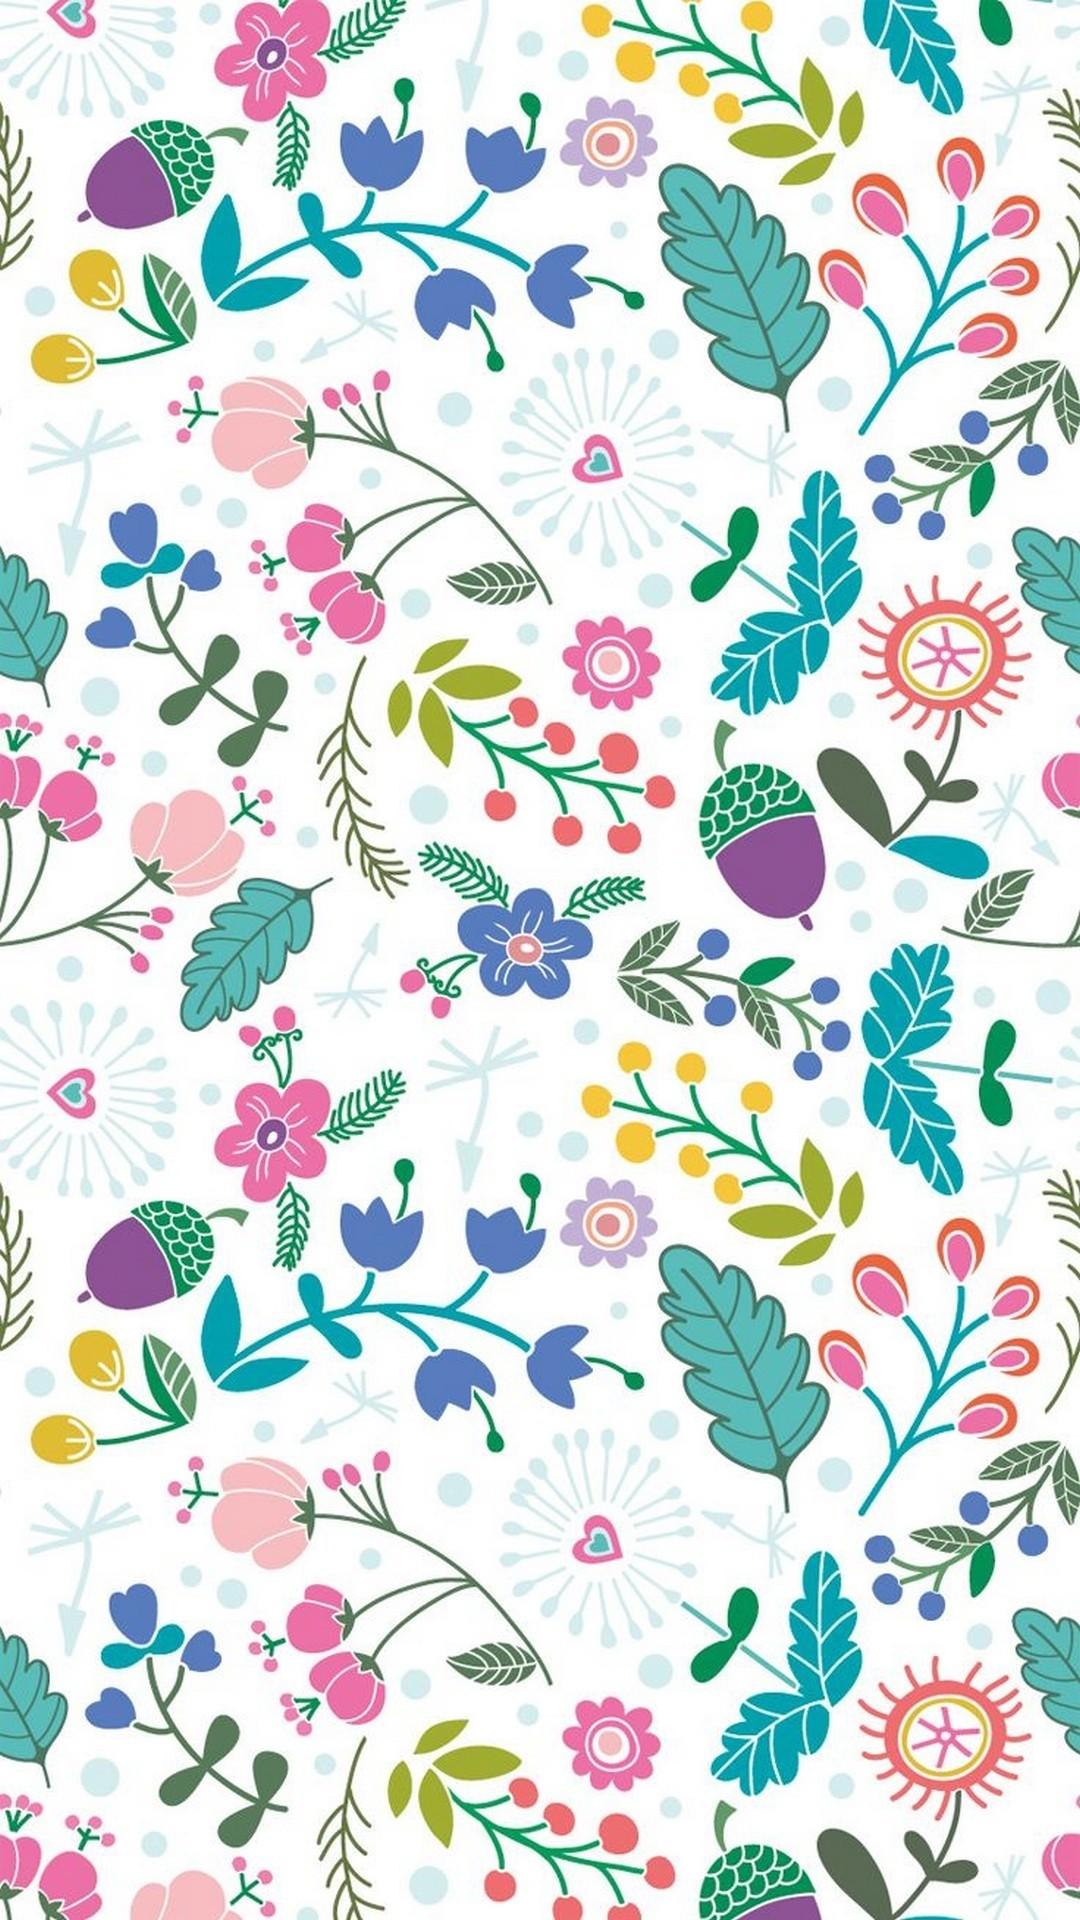 Pattern iphone 7 wallpaper